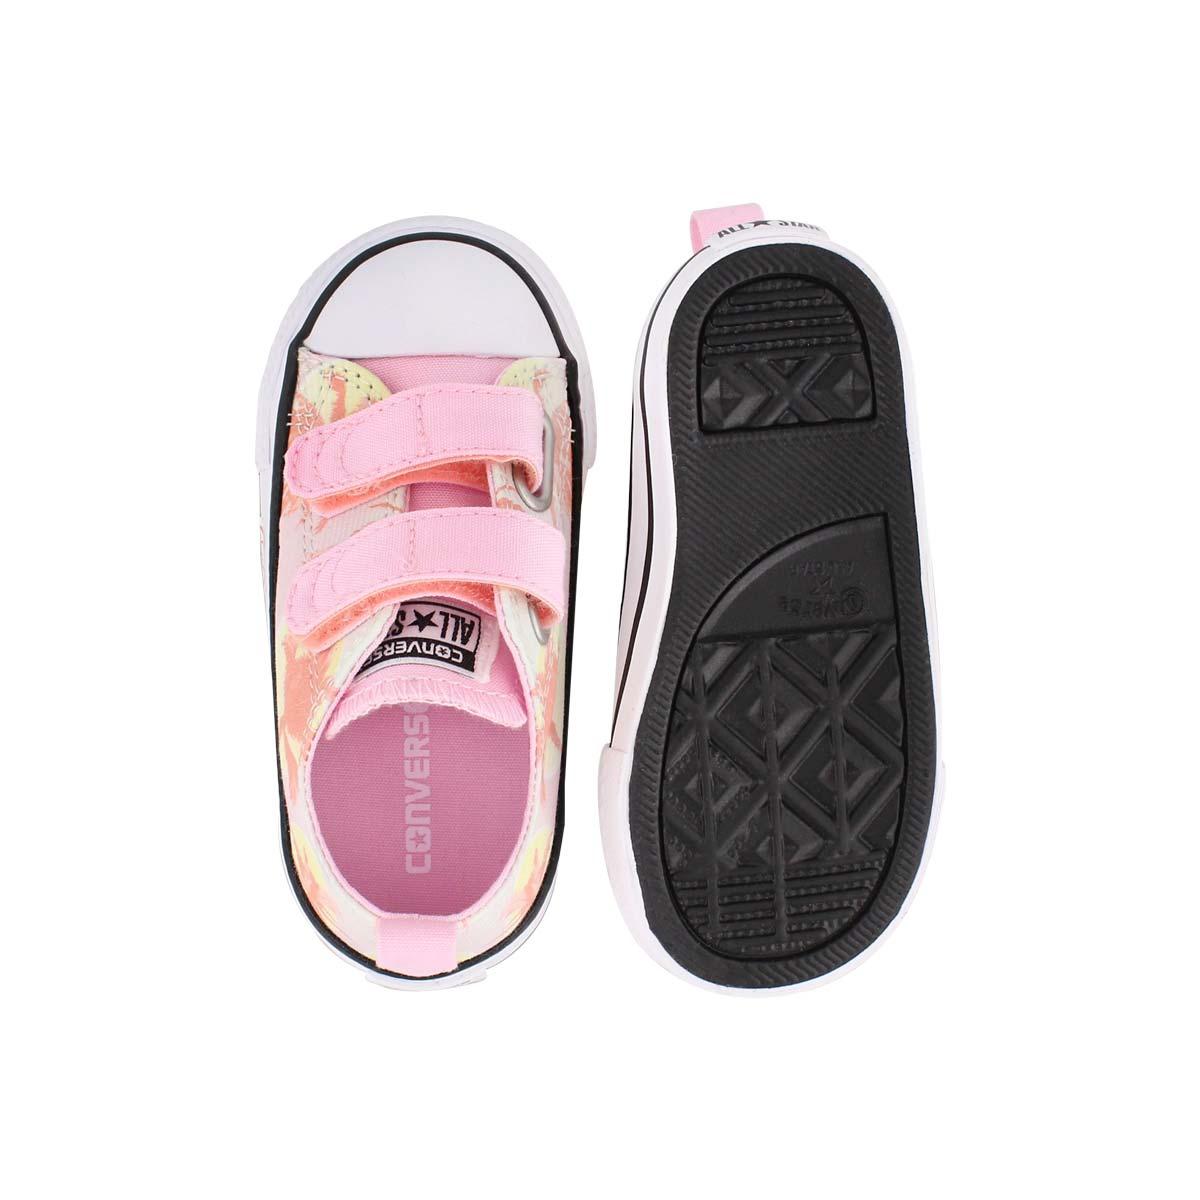 Infs-g CT AS 2V green/cherry sneaker